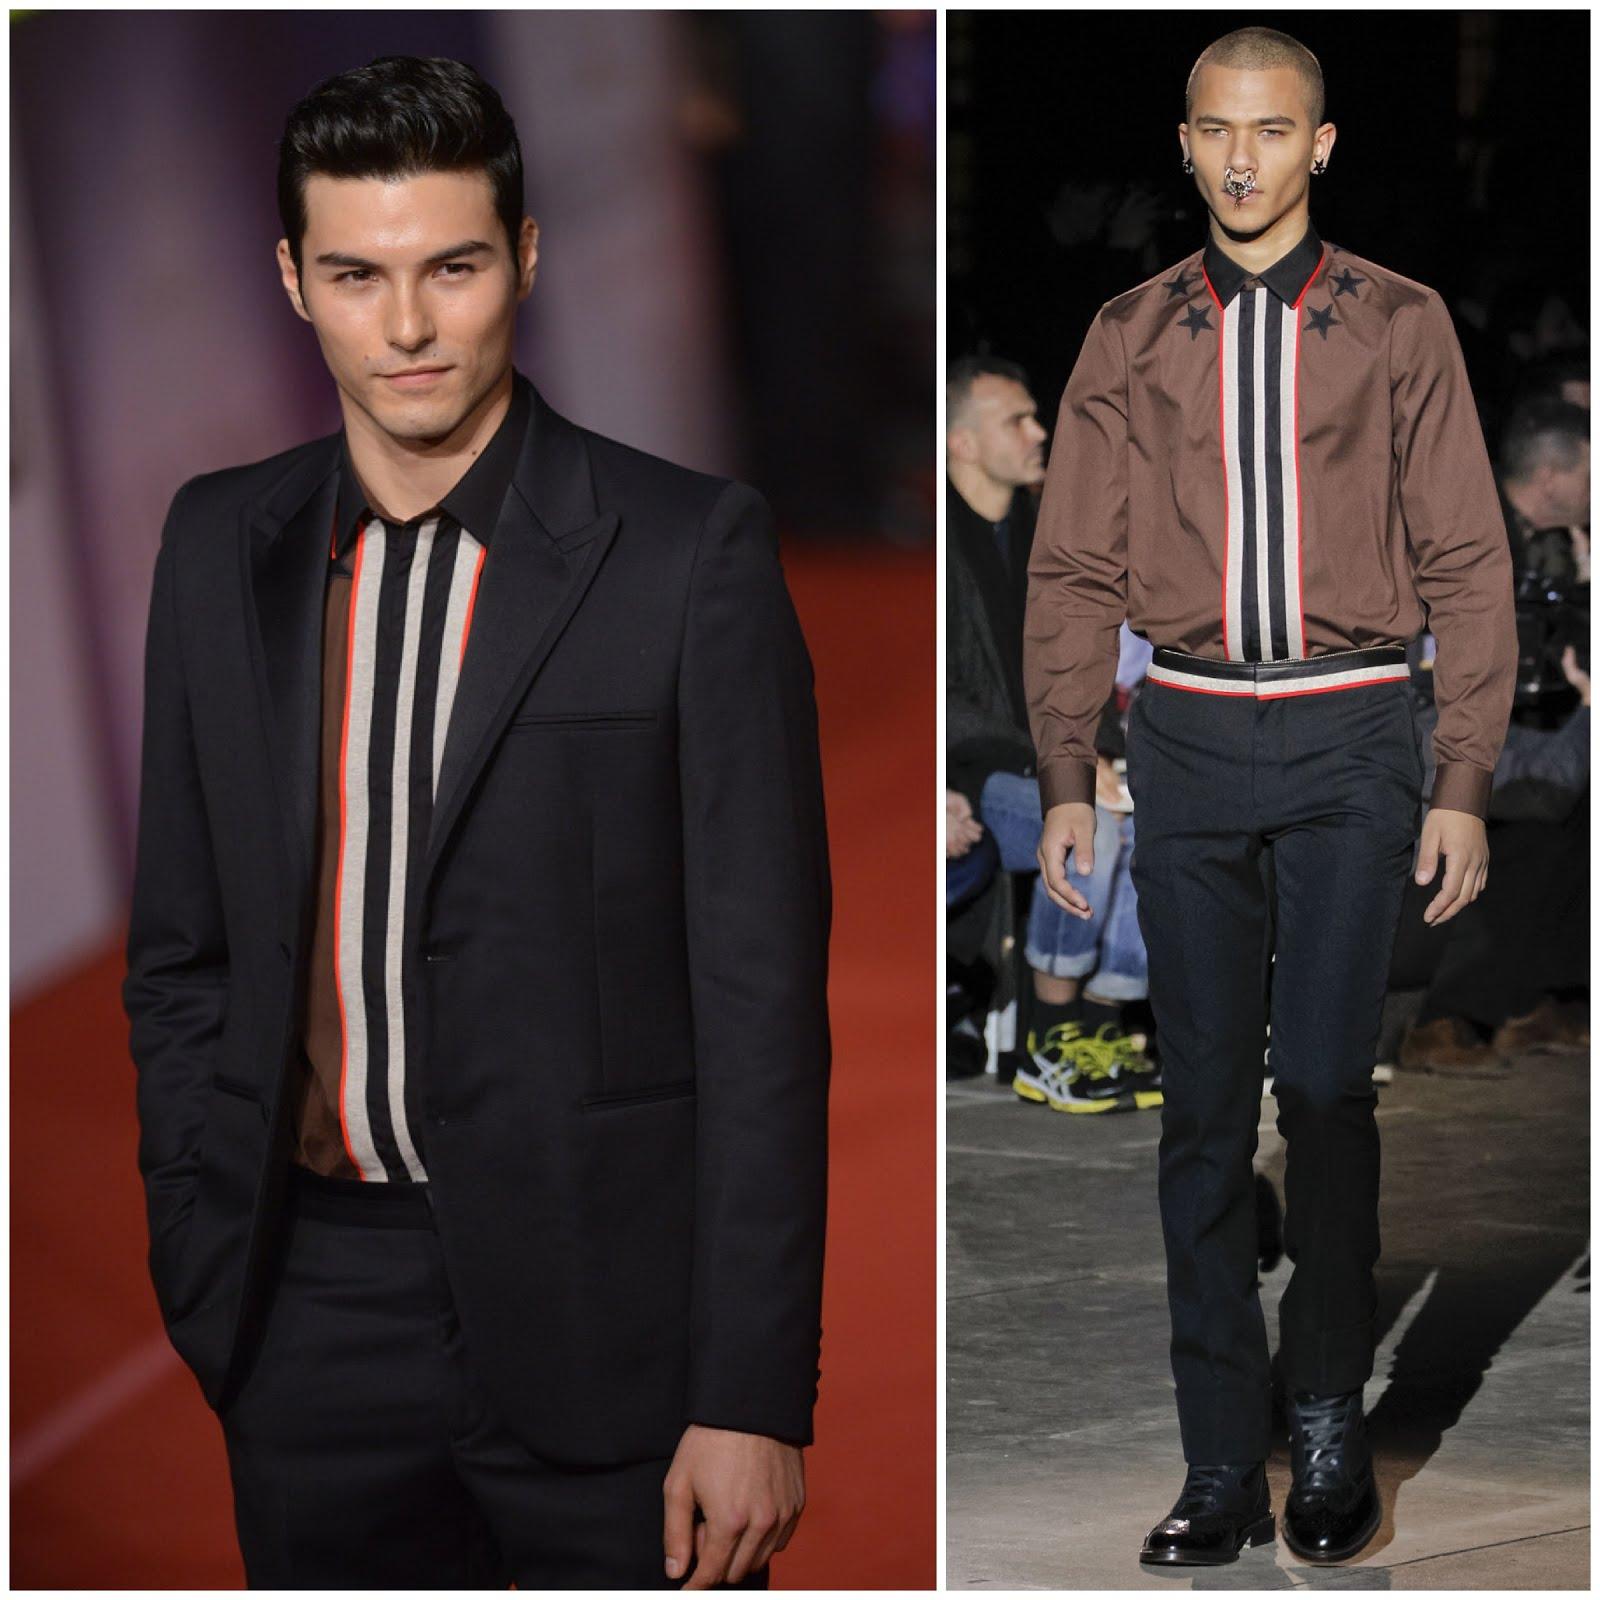 00O00 London Menswear Blog Celebrity Style Rhydian Vaughan (Feng Xiaoyue) in Givenchy - 49th Golden Horse Awards [鳳小岳现身第49届台湾电影金马奖颁奖礼, 身穿 Givenchy 衬衫]